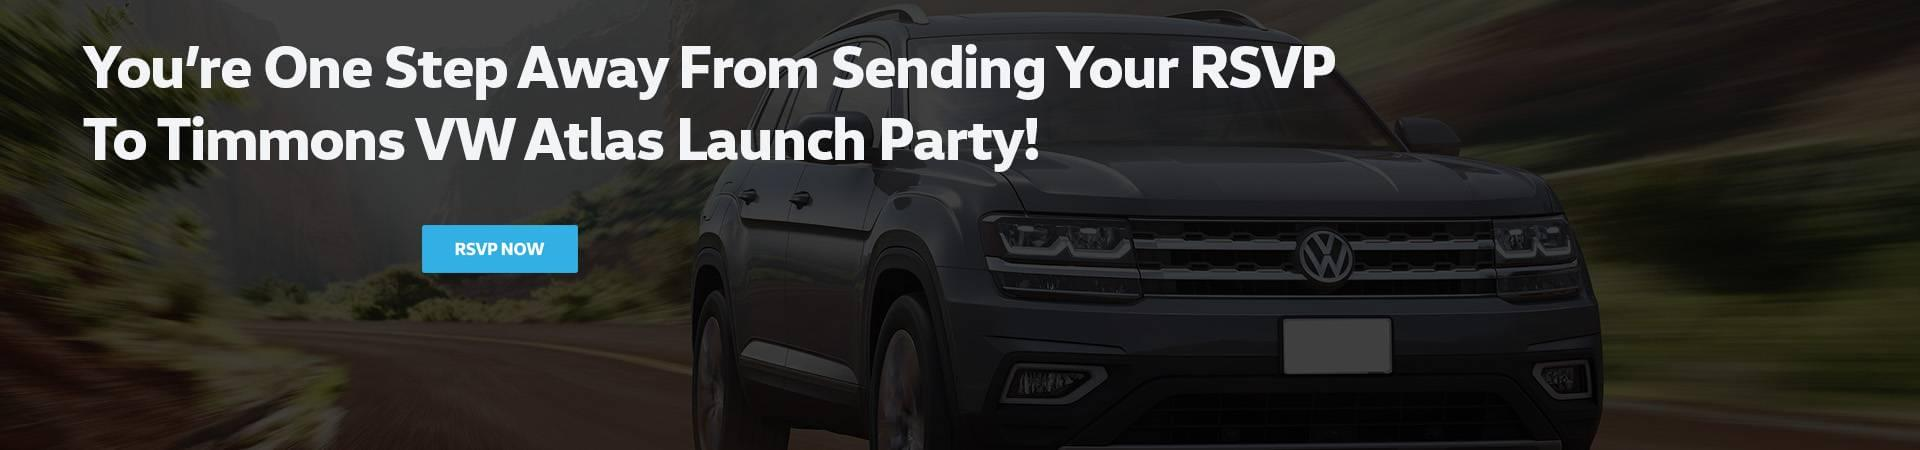 Atlas_Launch_Party_banner